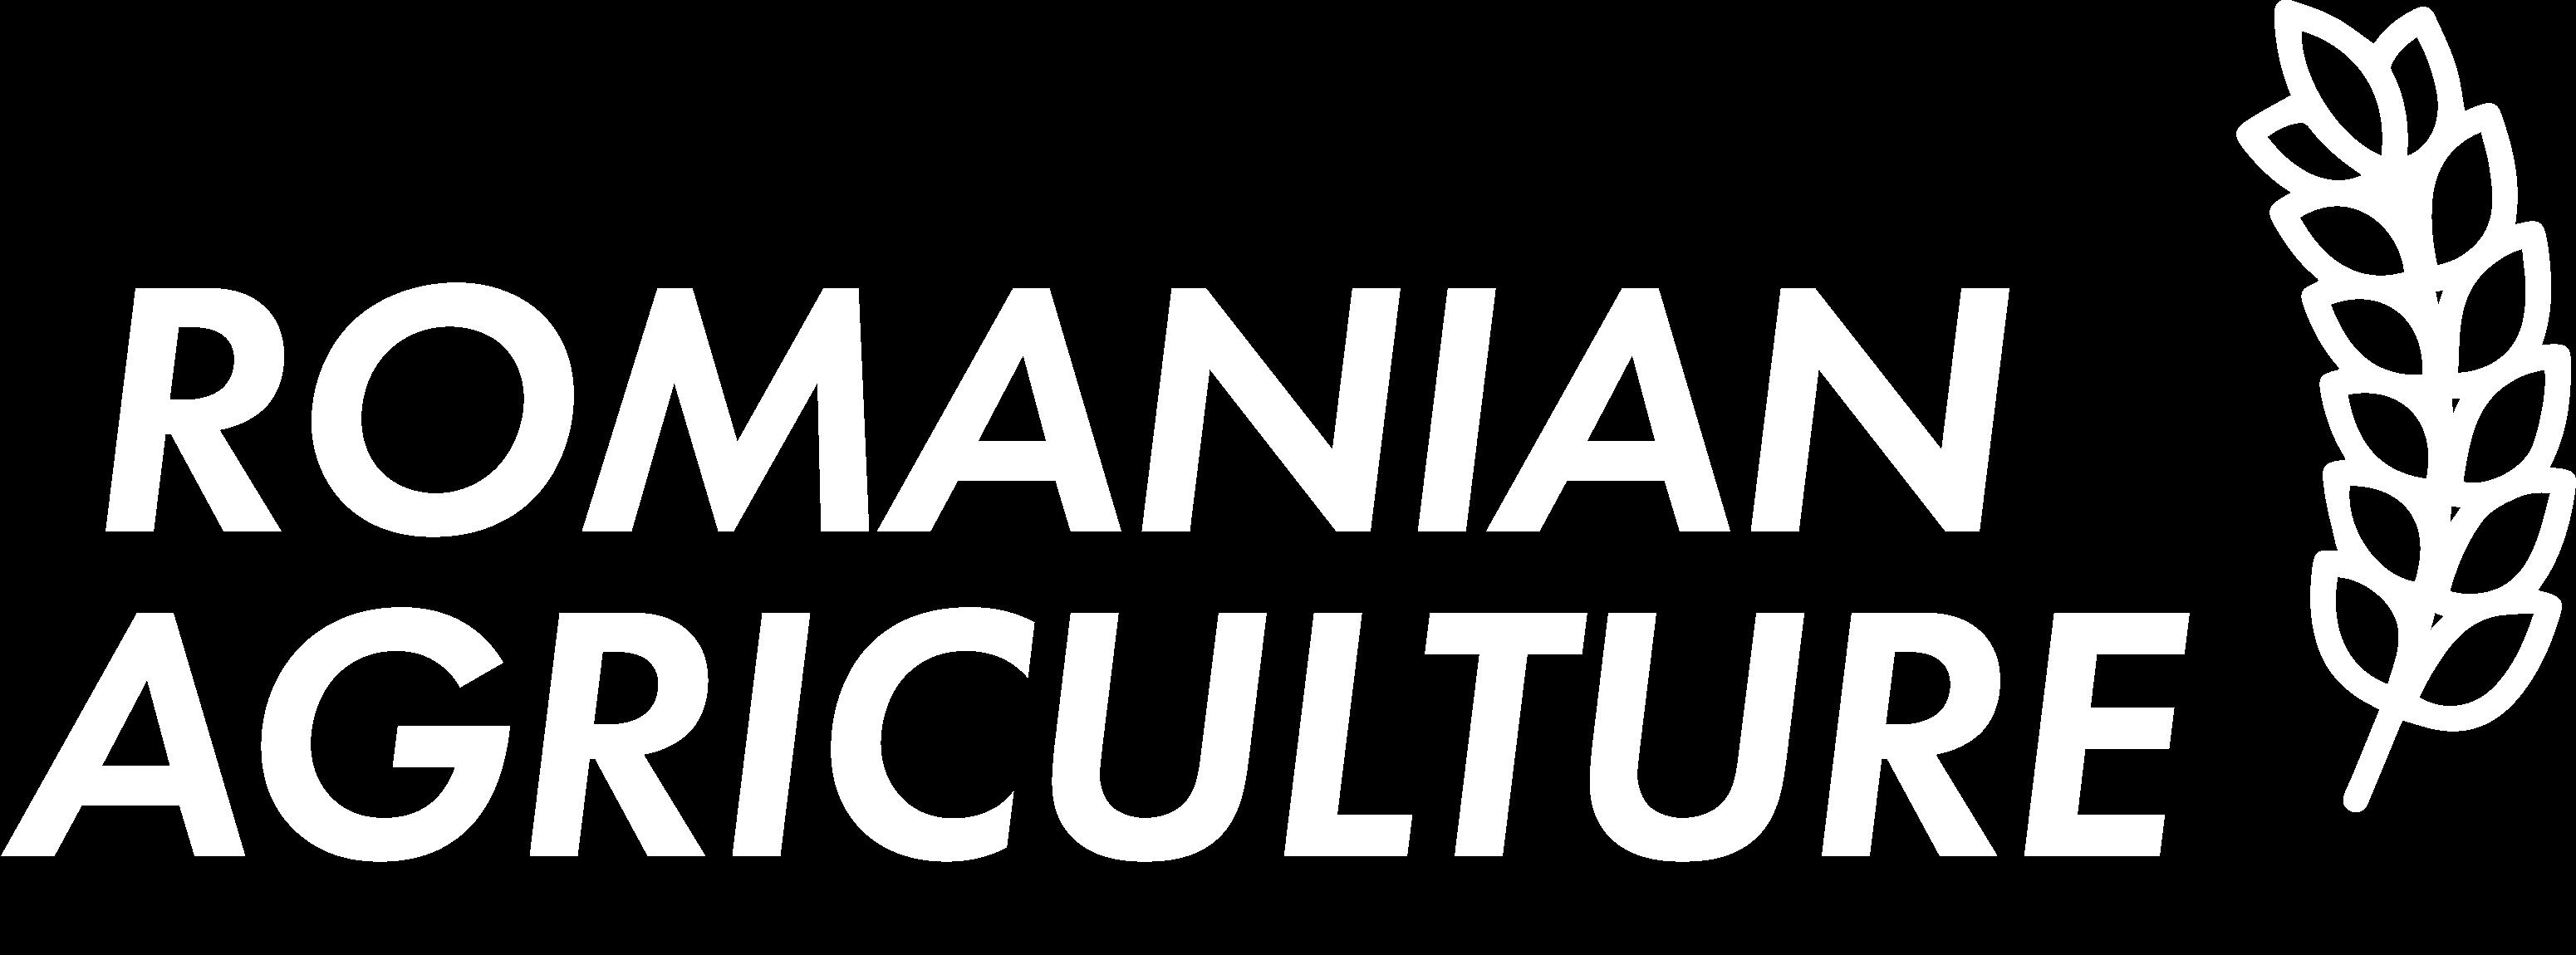 Romanian Agriculture